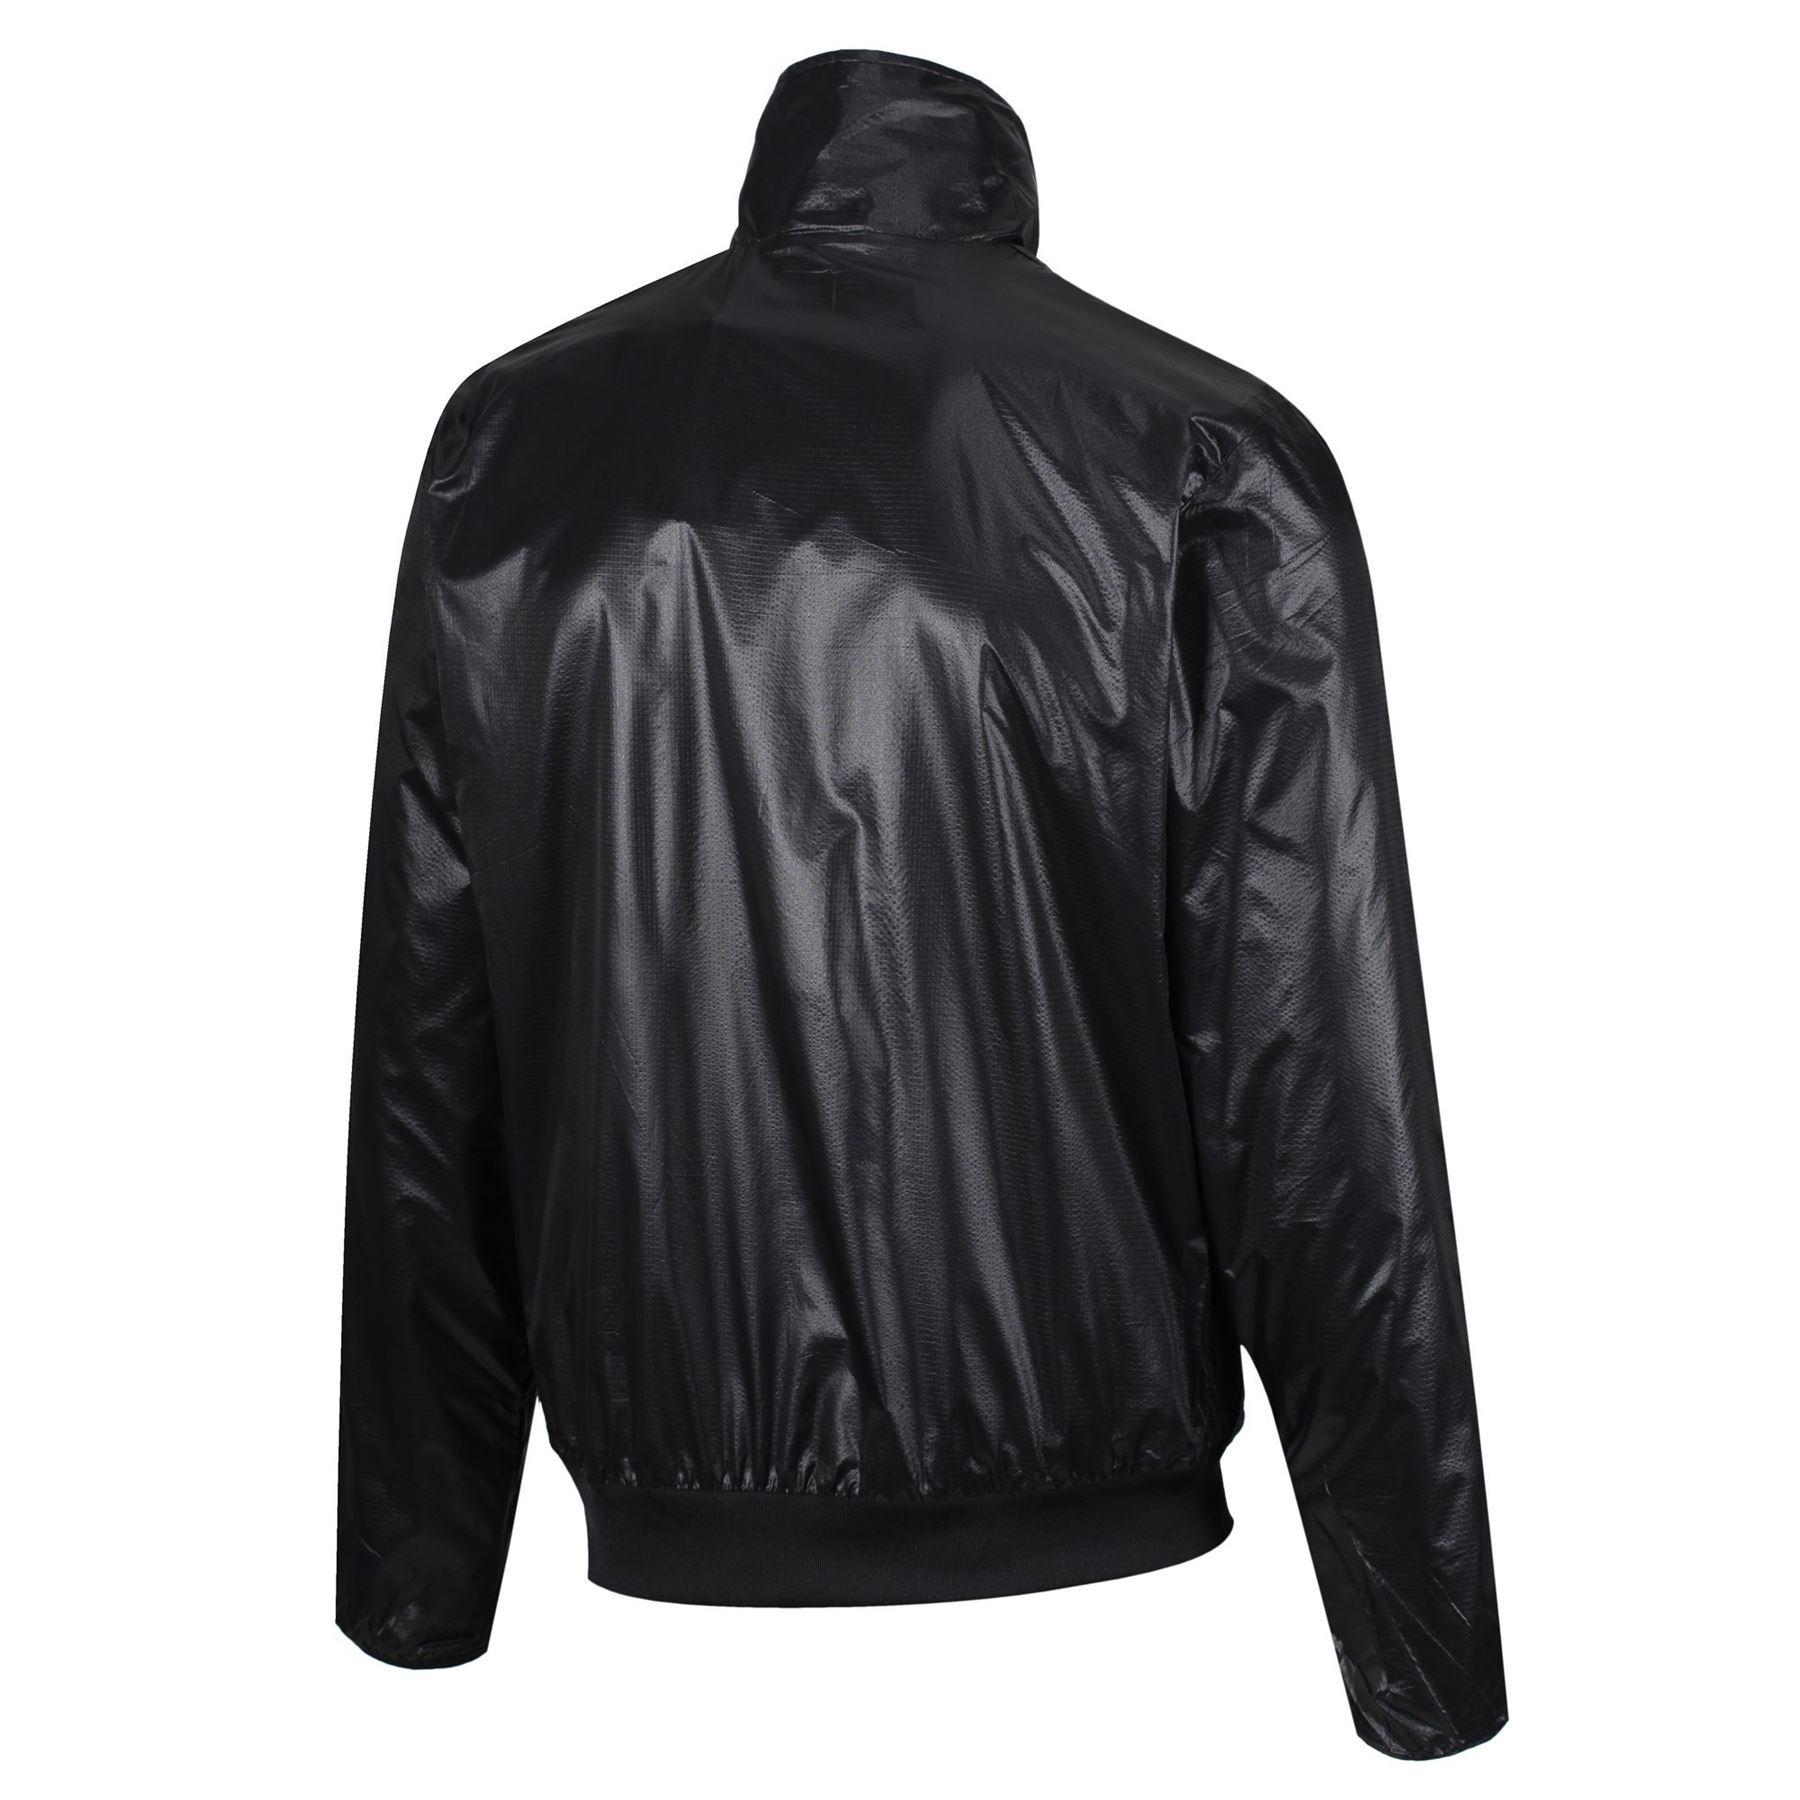 Detalles acerca de Adidas original balance beckenbauer chaqueta negro retro XS S M L con cremallera mostrar título original